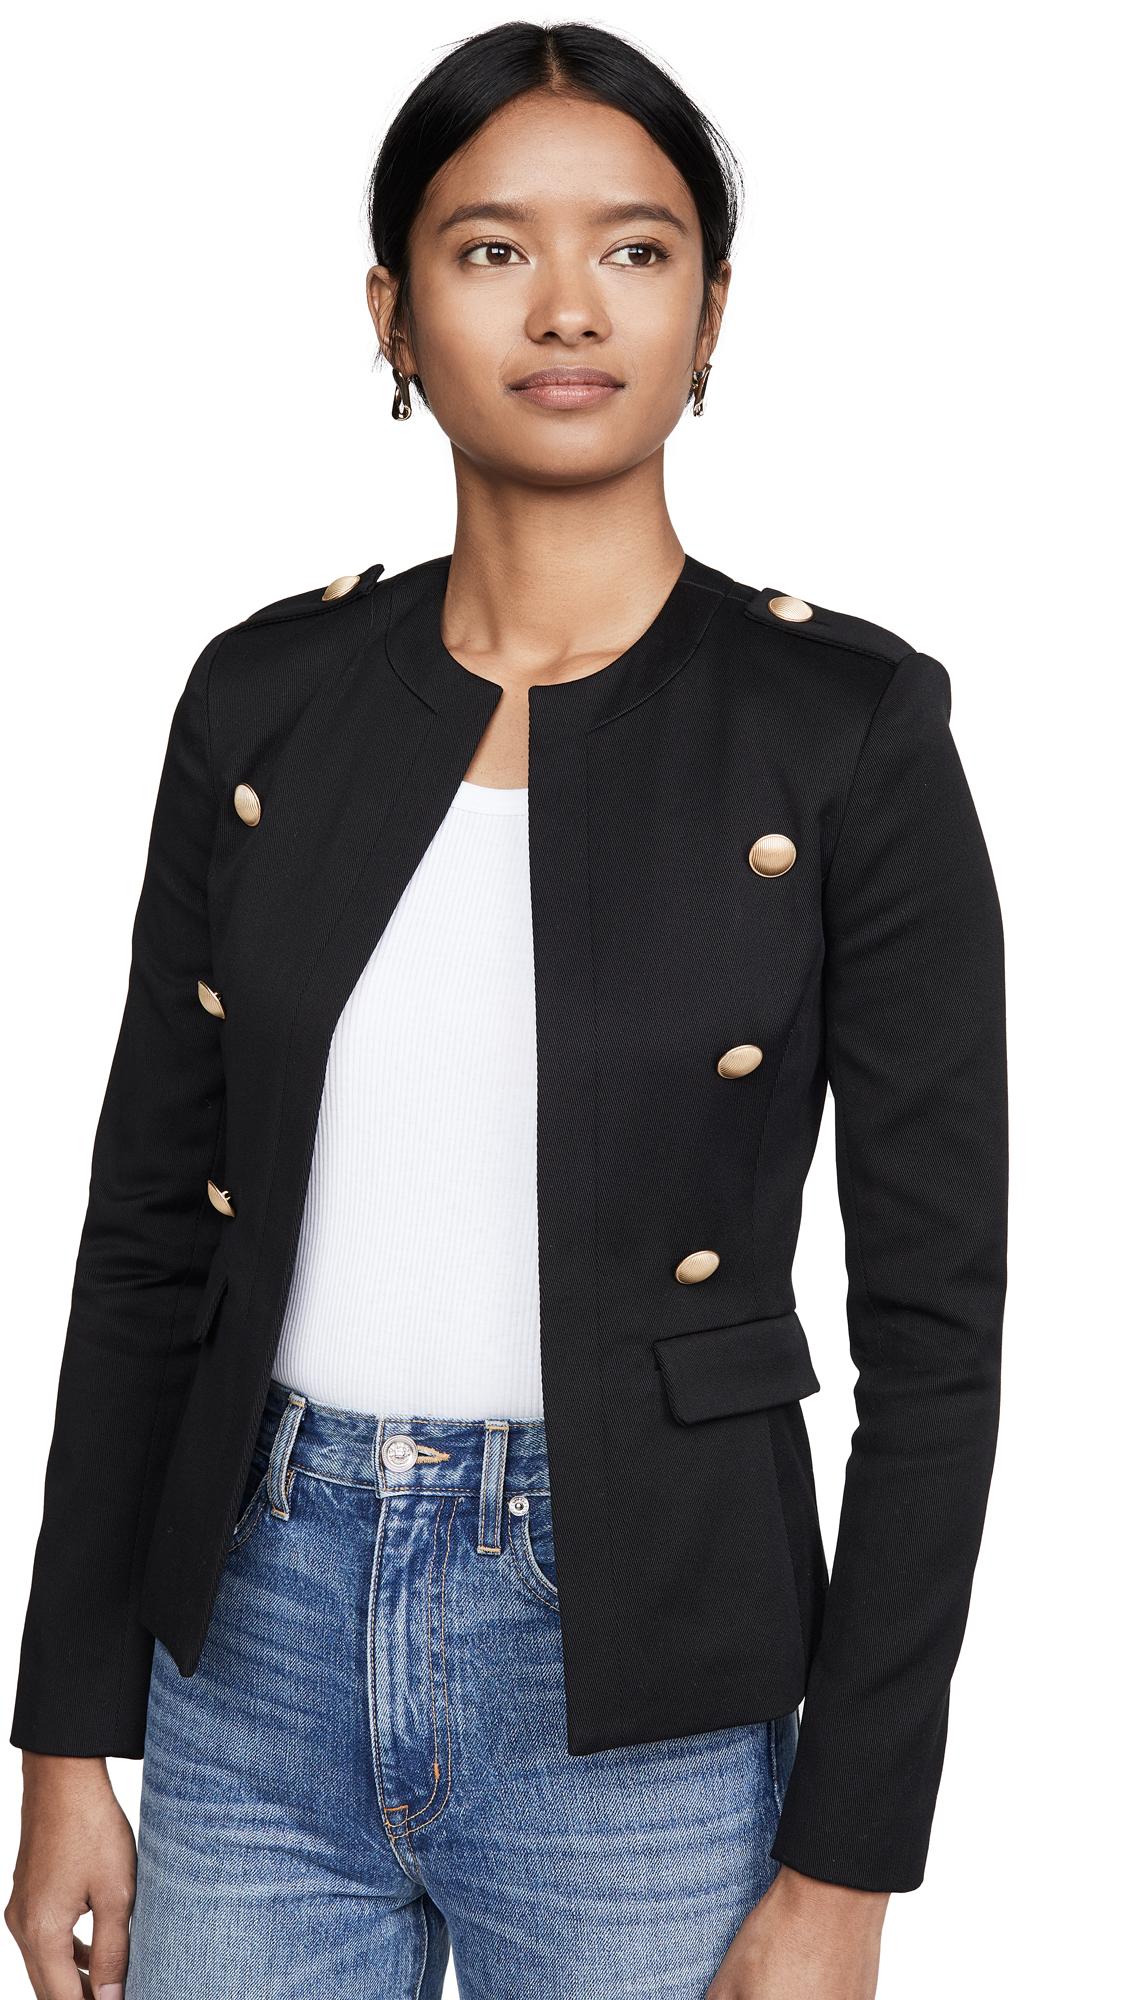 Buy L'AGENCE Rye Military Jacket with Round Neck online beautiful L'AGENCE Jackets, Coats, Coats